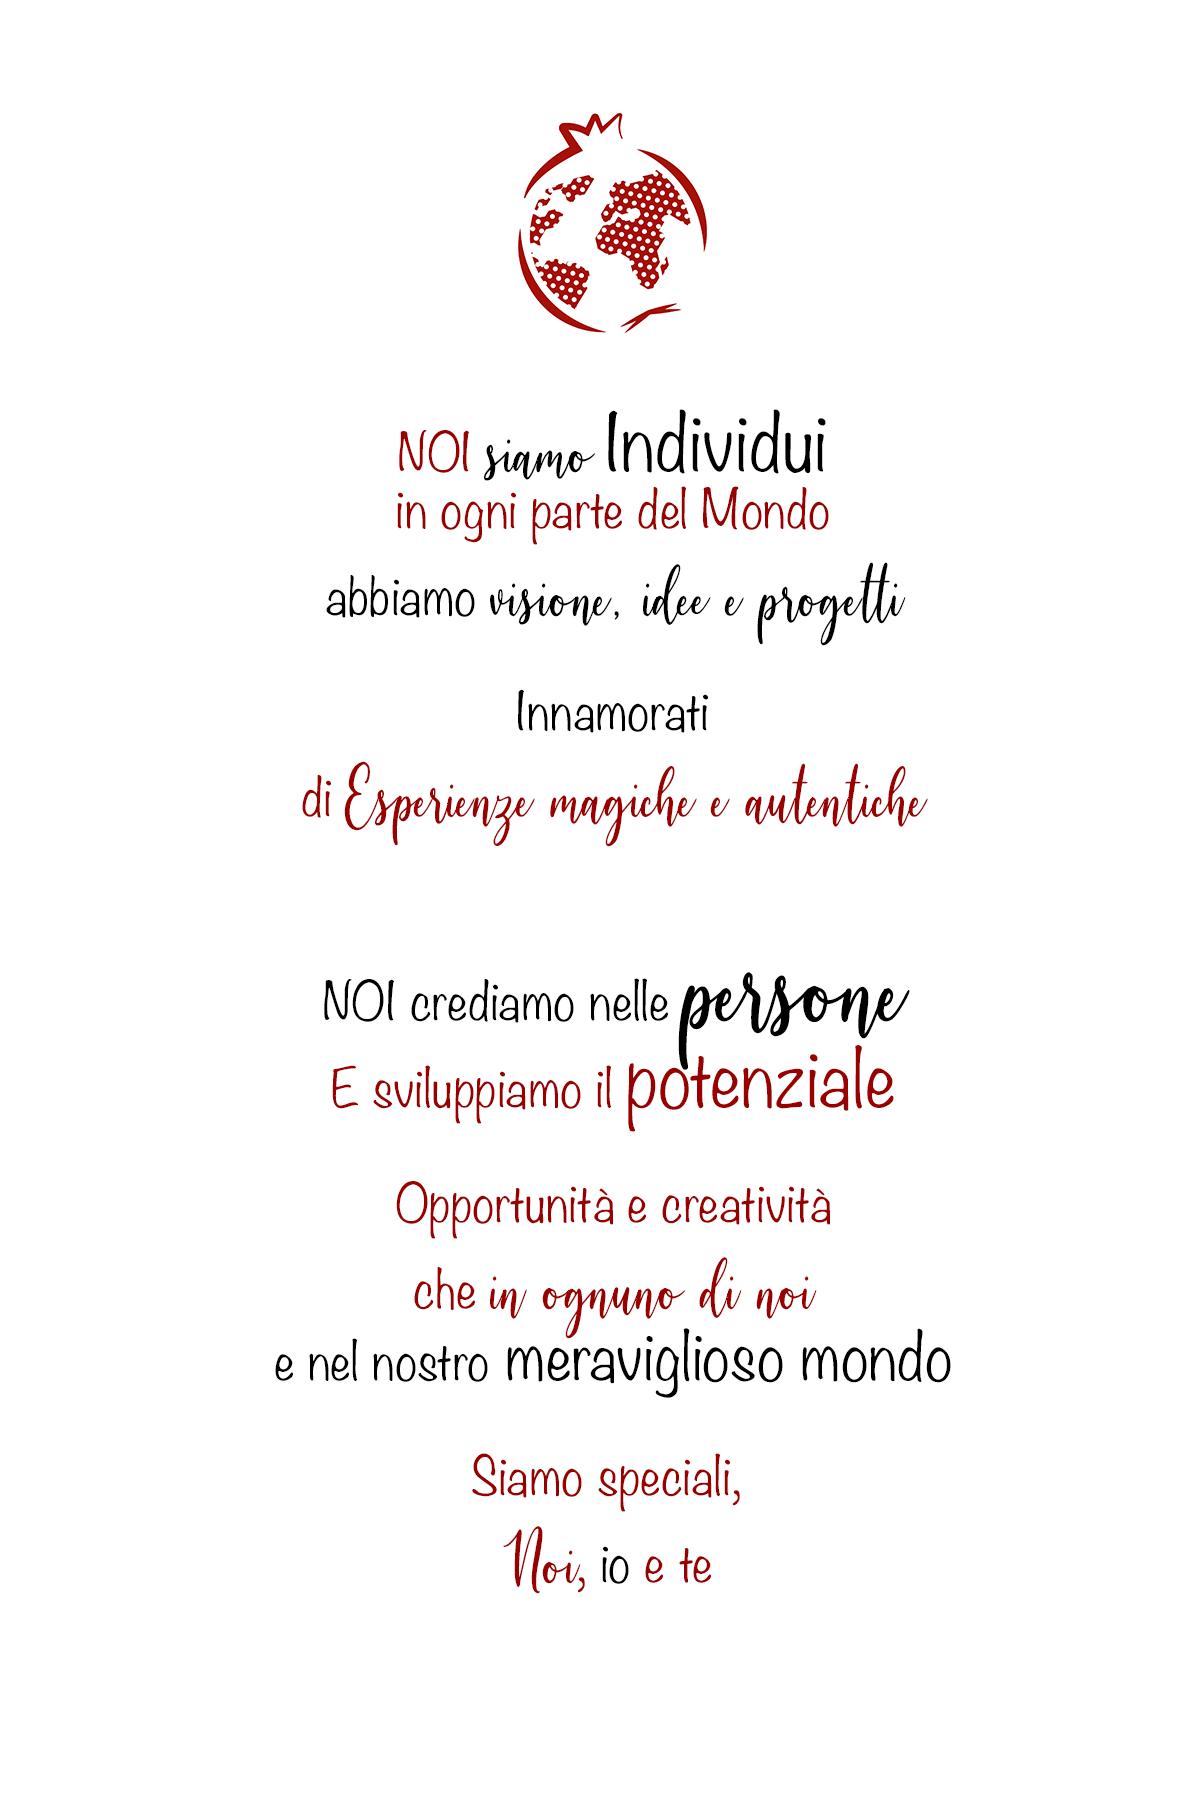 https://www.ipomehotels.com/wp-content/uploads/2020/05/manifesto.png